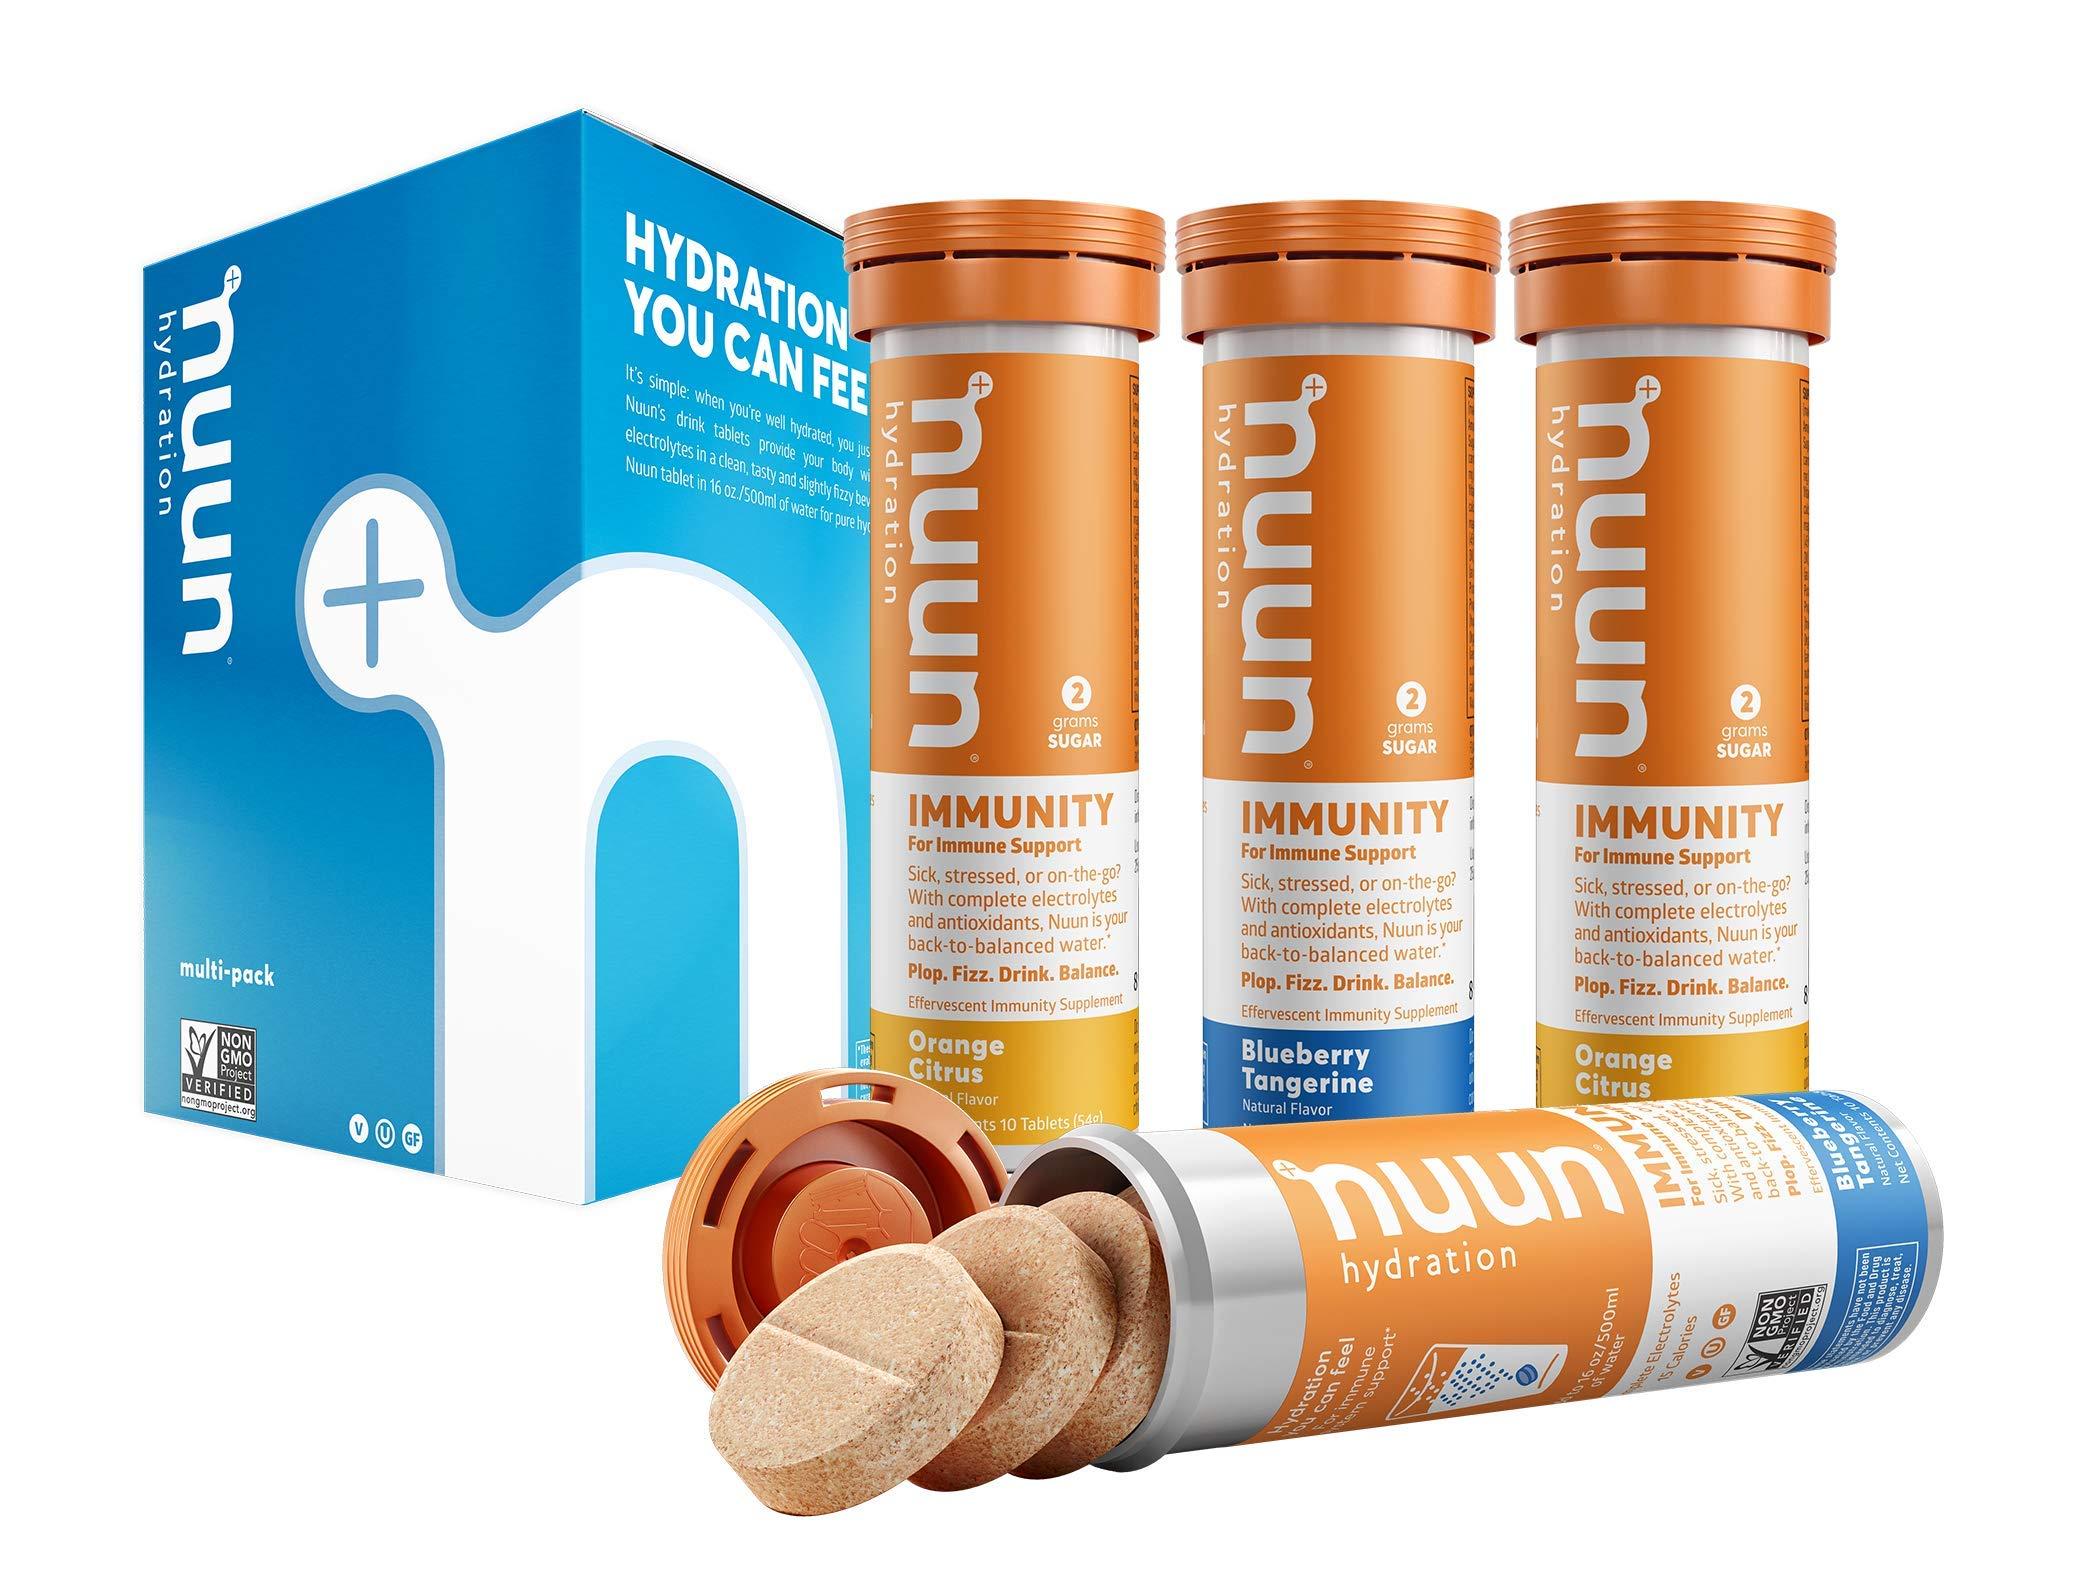 Nuun Immunity: Zinc, Turmeric, Elderberry, Ginger, Echinacea, Electrolytes for Anti-Inflammatory & Antioxidant Boost in Immune Support, Blueberry Tangerine/Orange Citrus, 4 Tubes (40 Servings)